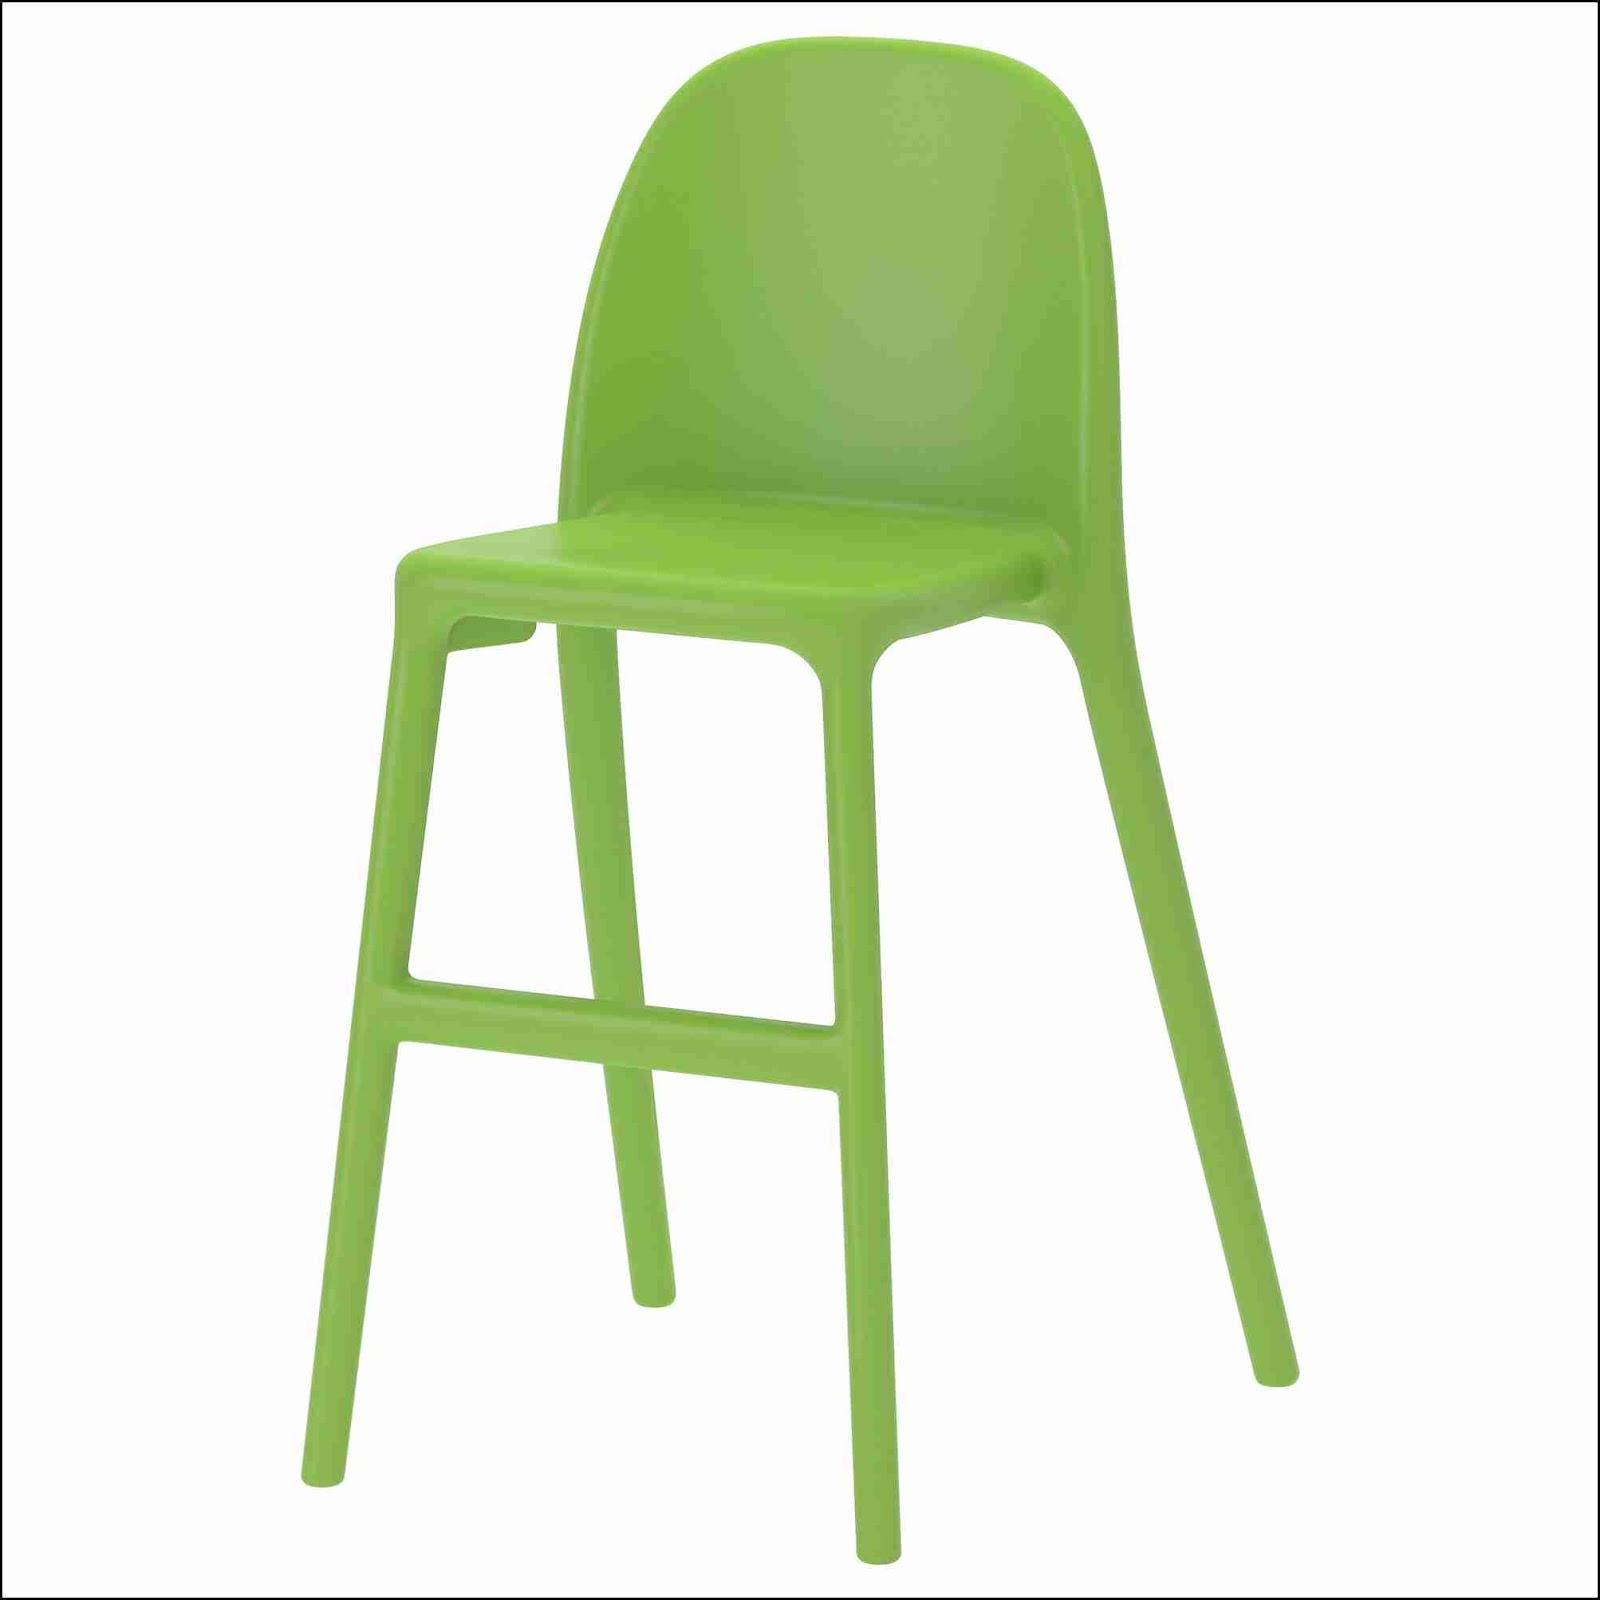 Chaise Haute Enfant Ikea Home Idea